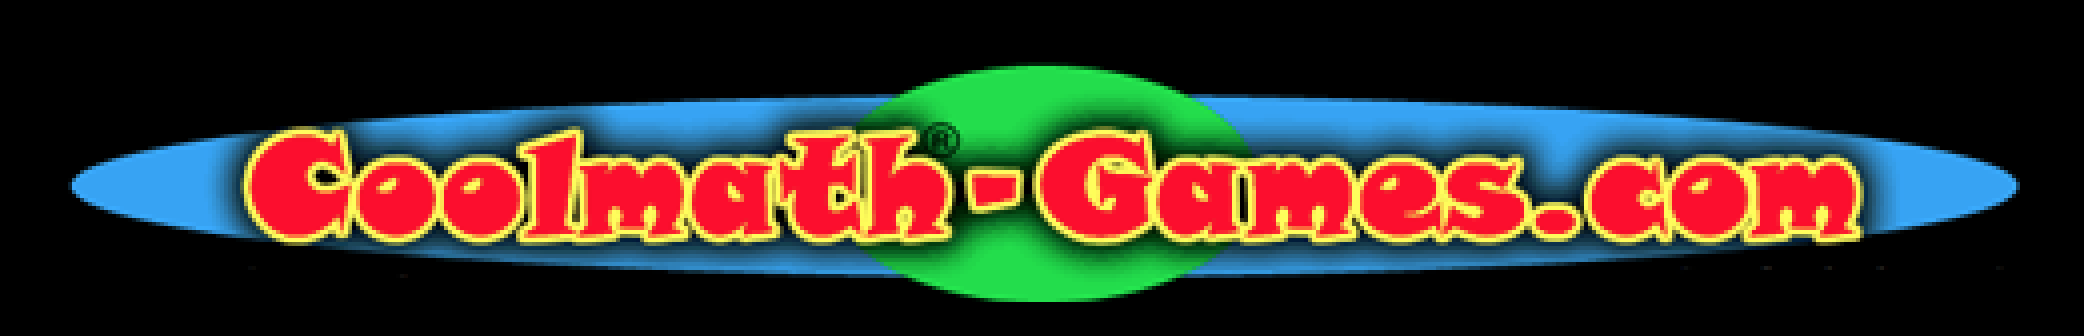 Building Games at Coolmath-Games.com